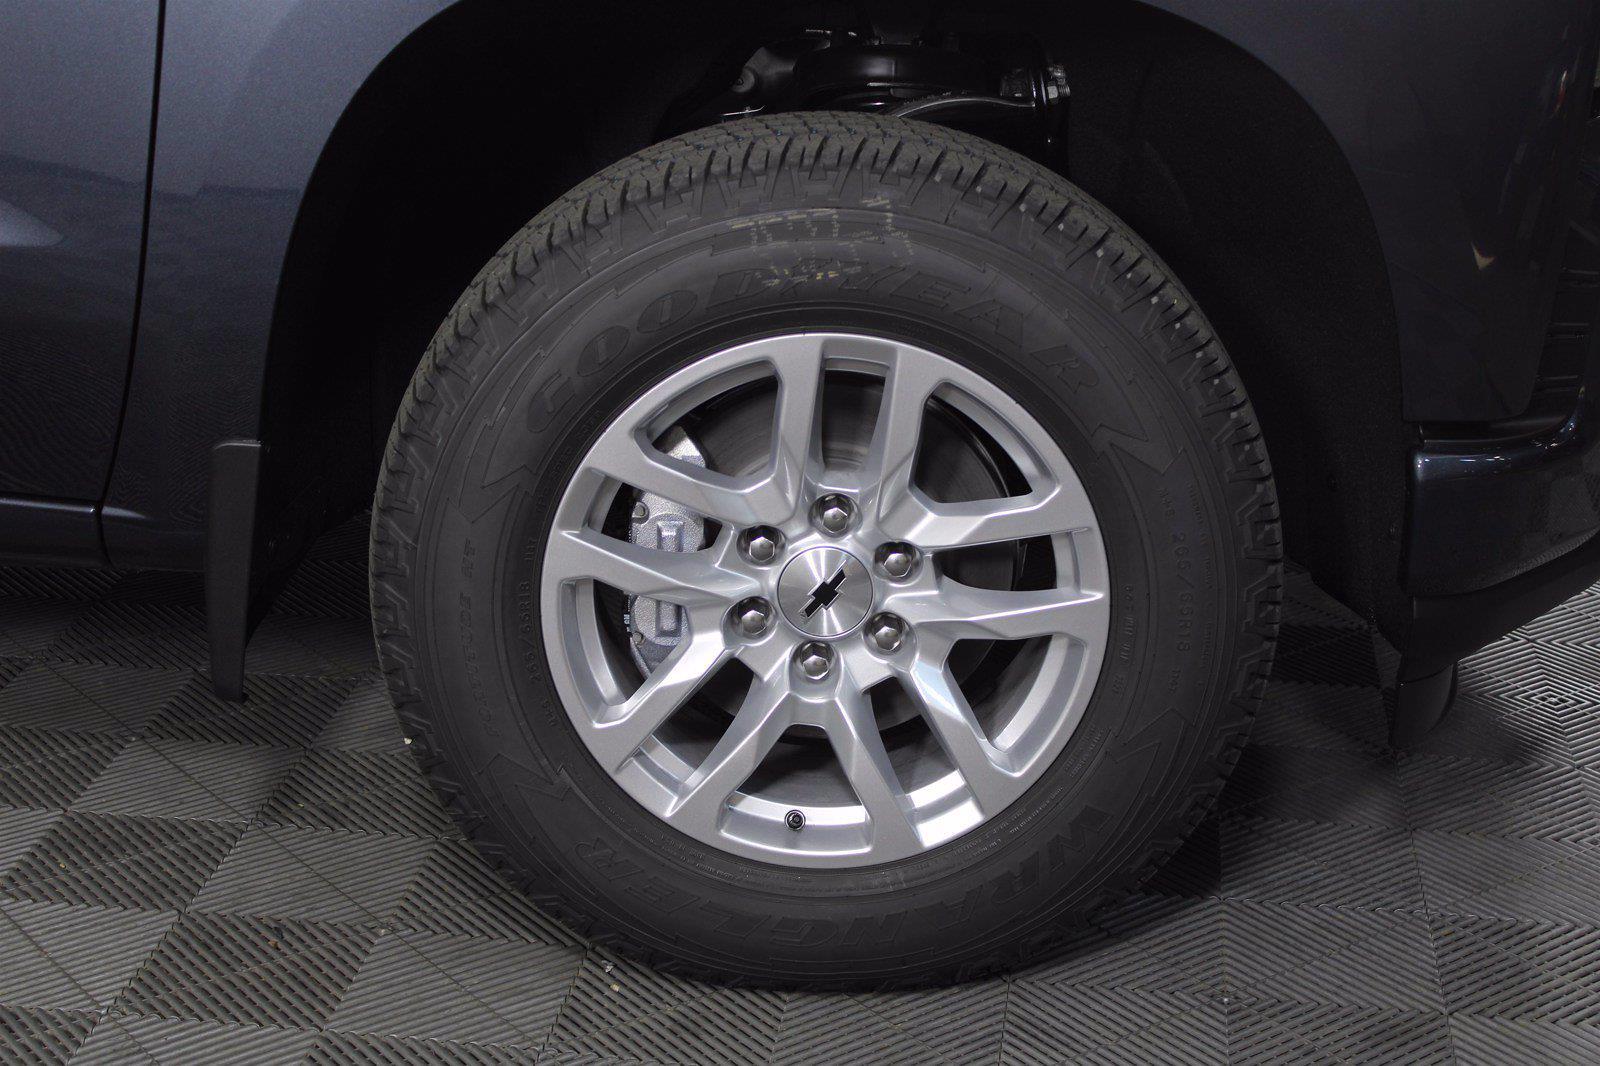 2021 Chevrolet Silverado 1500 Crew Cab 4x4, Pickup #D111142 - photo 6